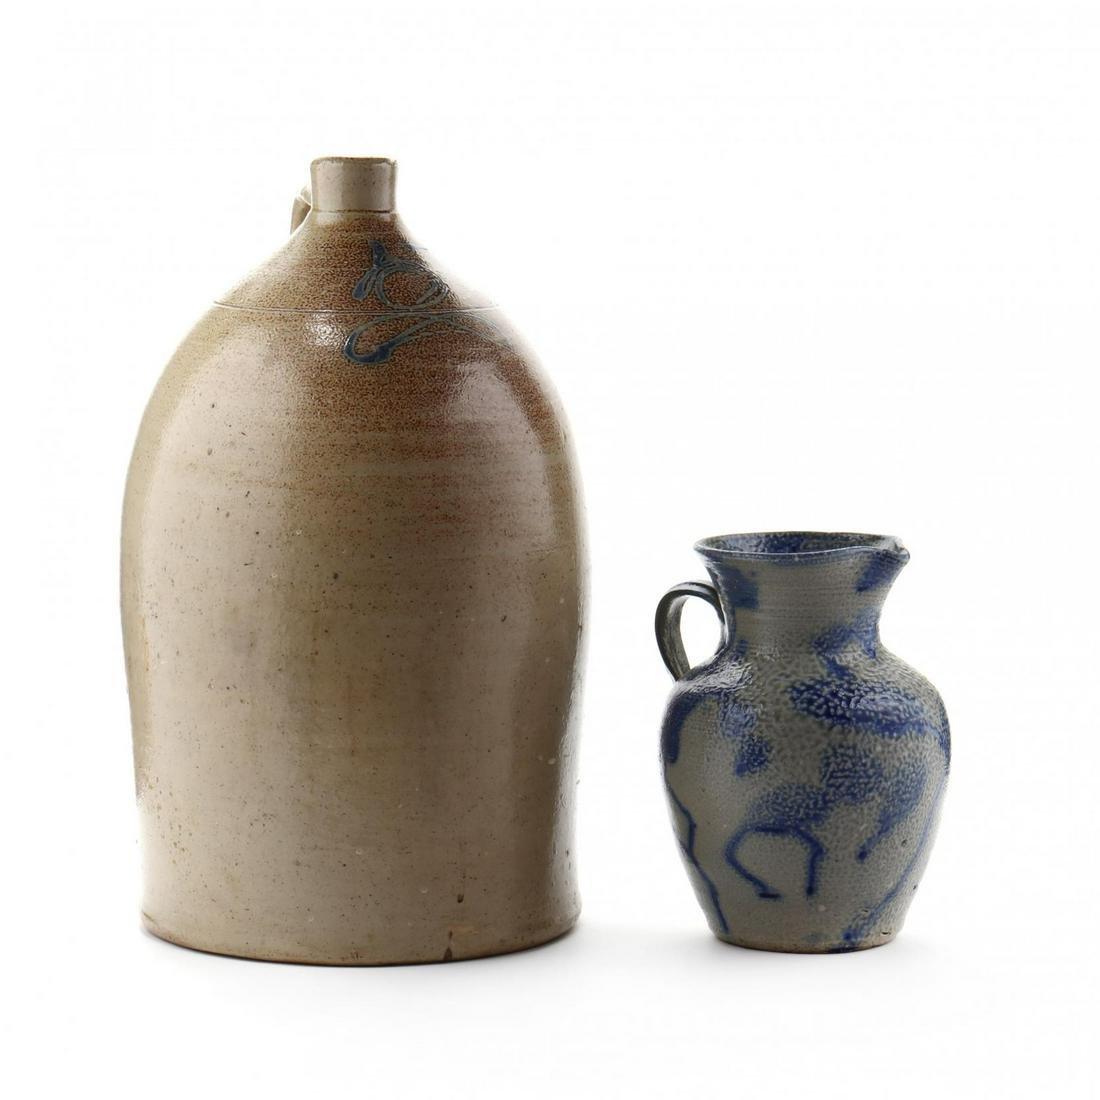 Two Salt Glazed Vessels